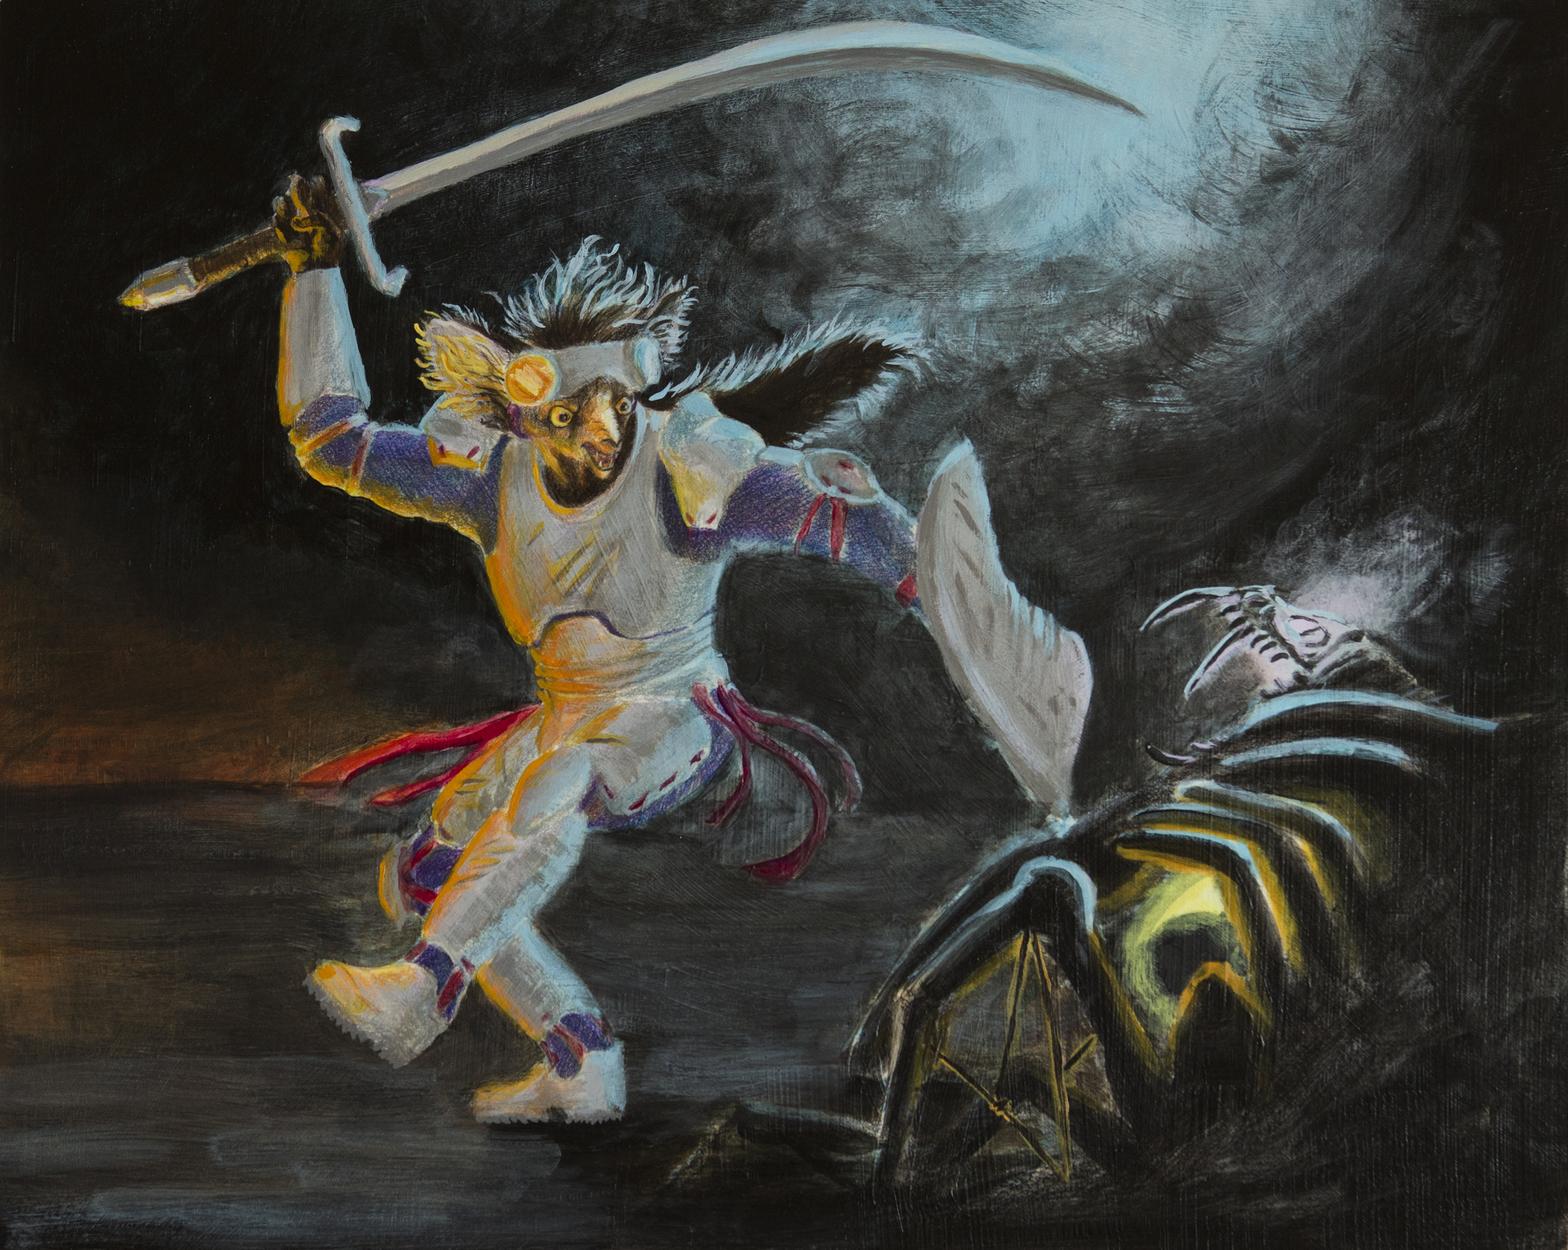 Nightfighter  Artwork by Erika Espiritu